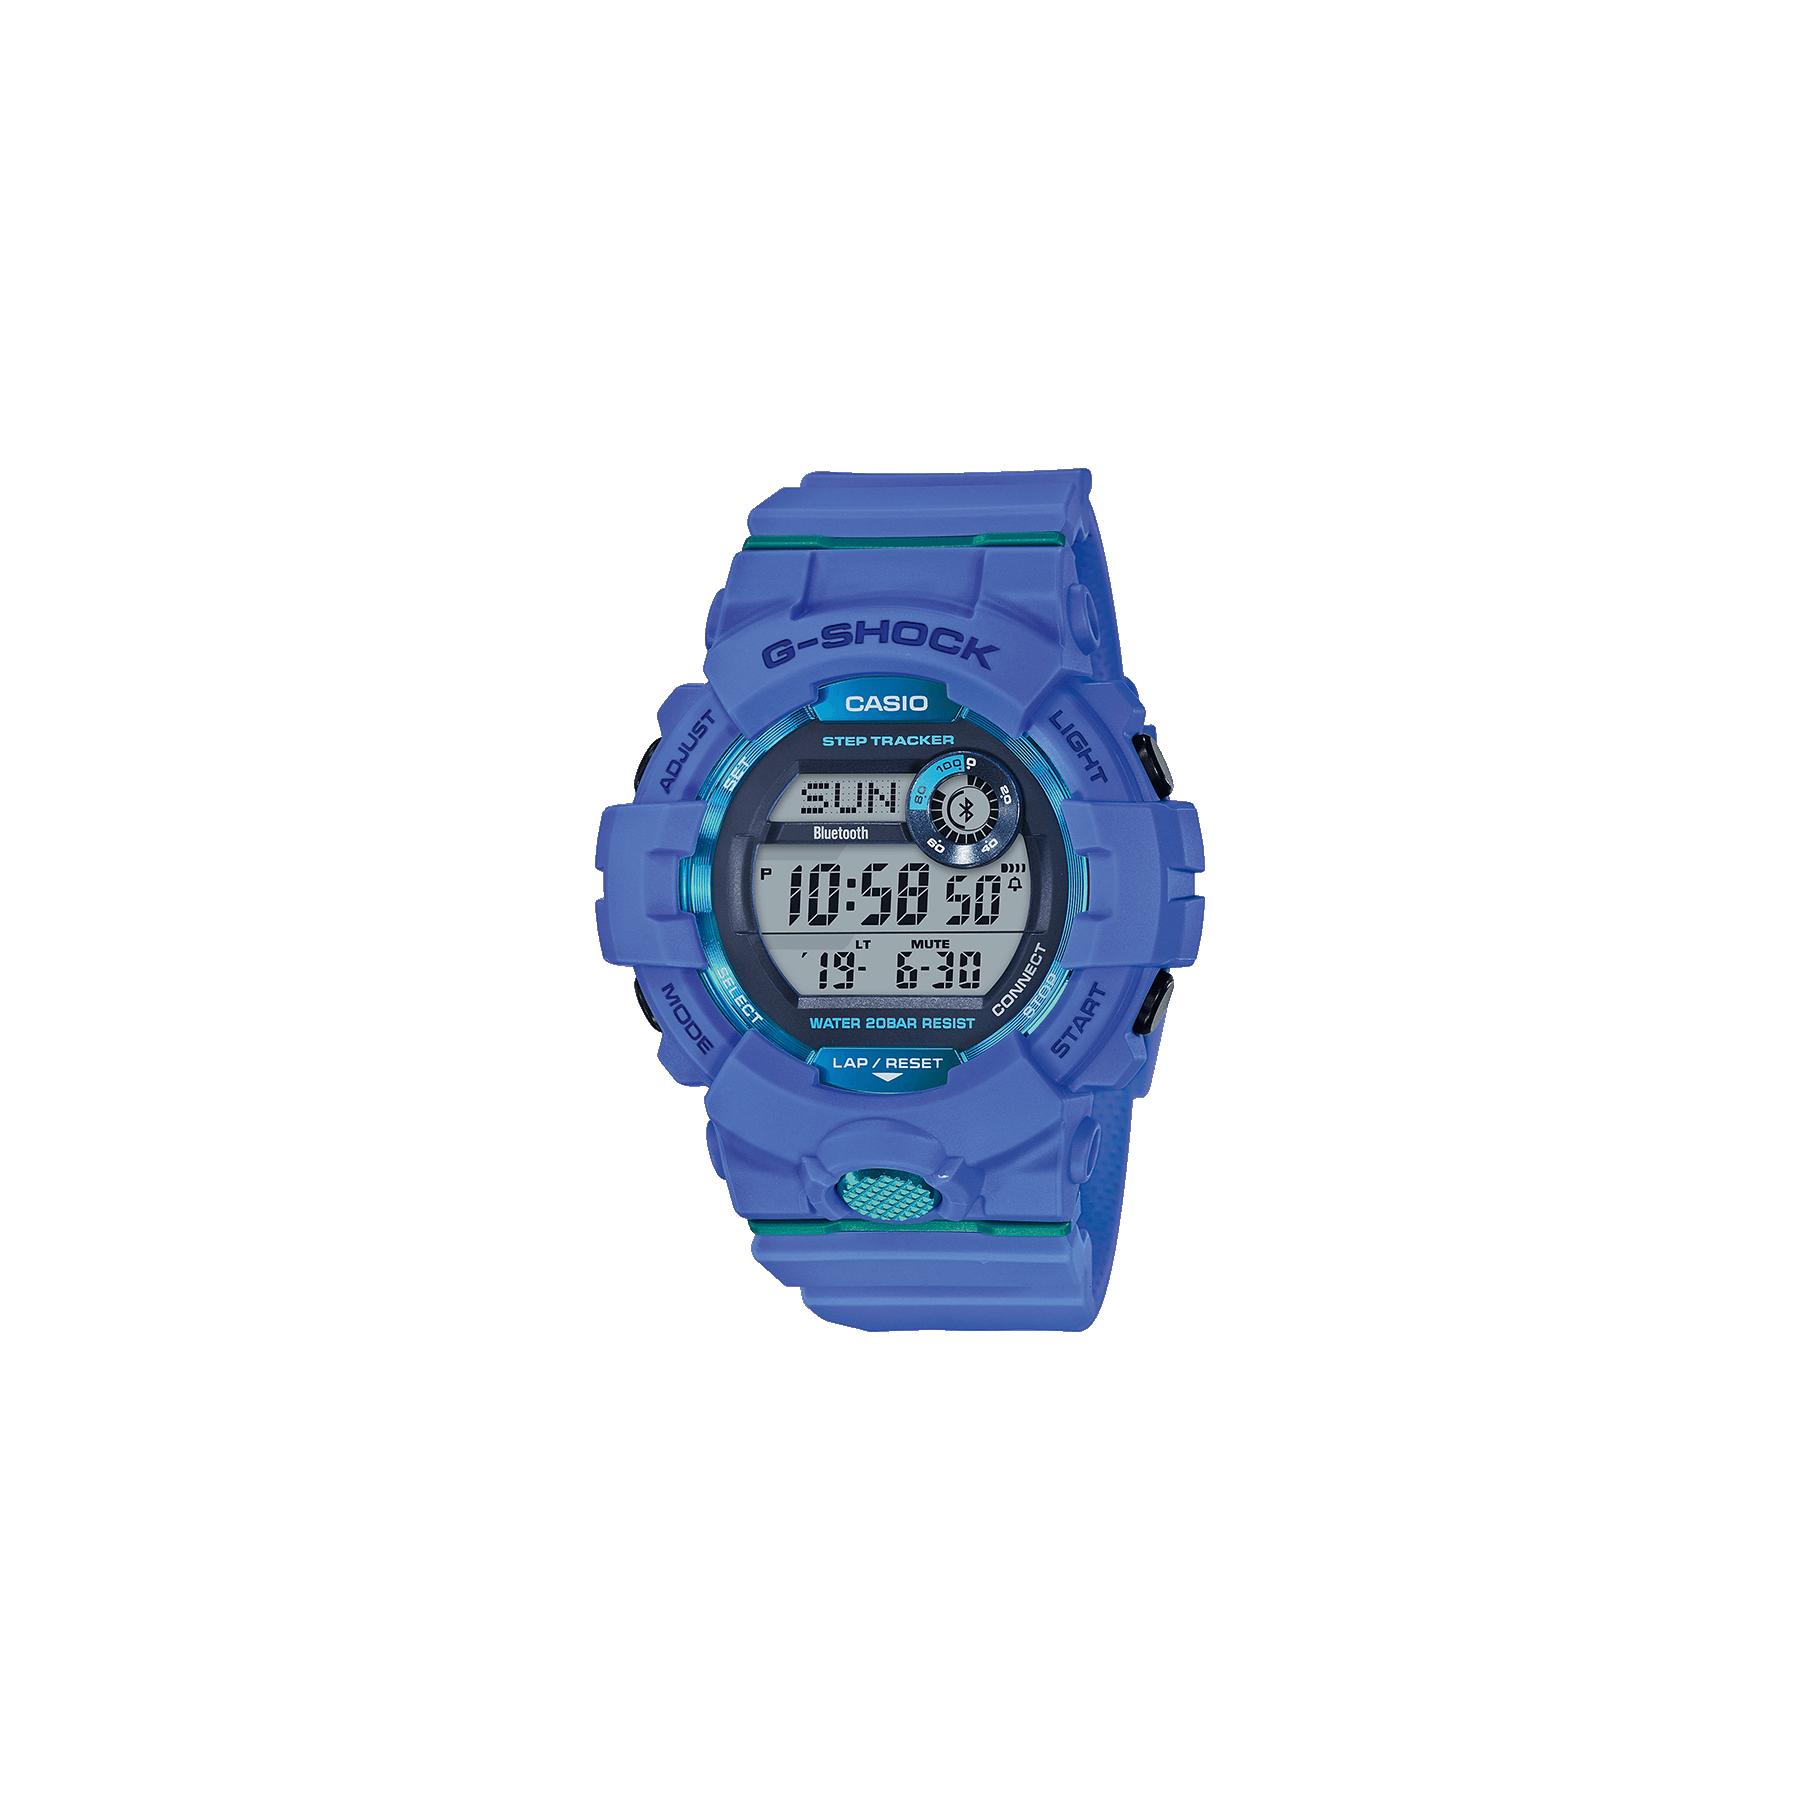 OROLOGIO G-SHOCK GBD-800-2ER